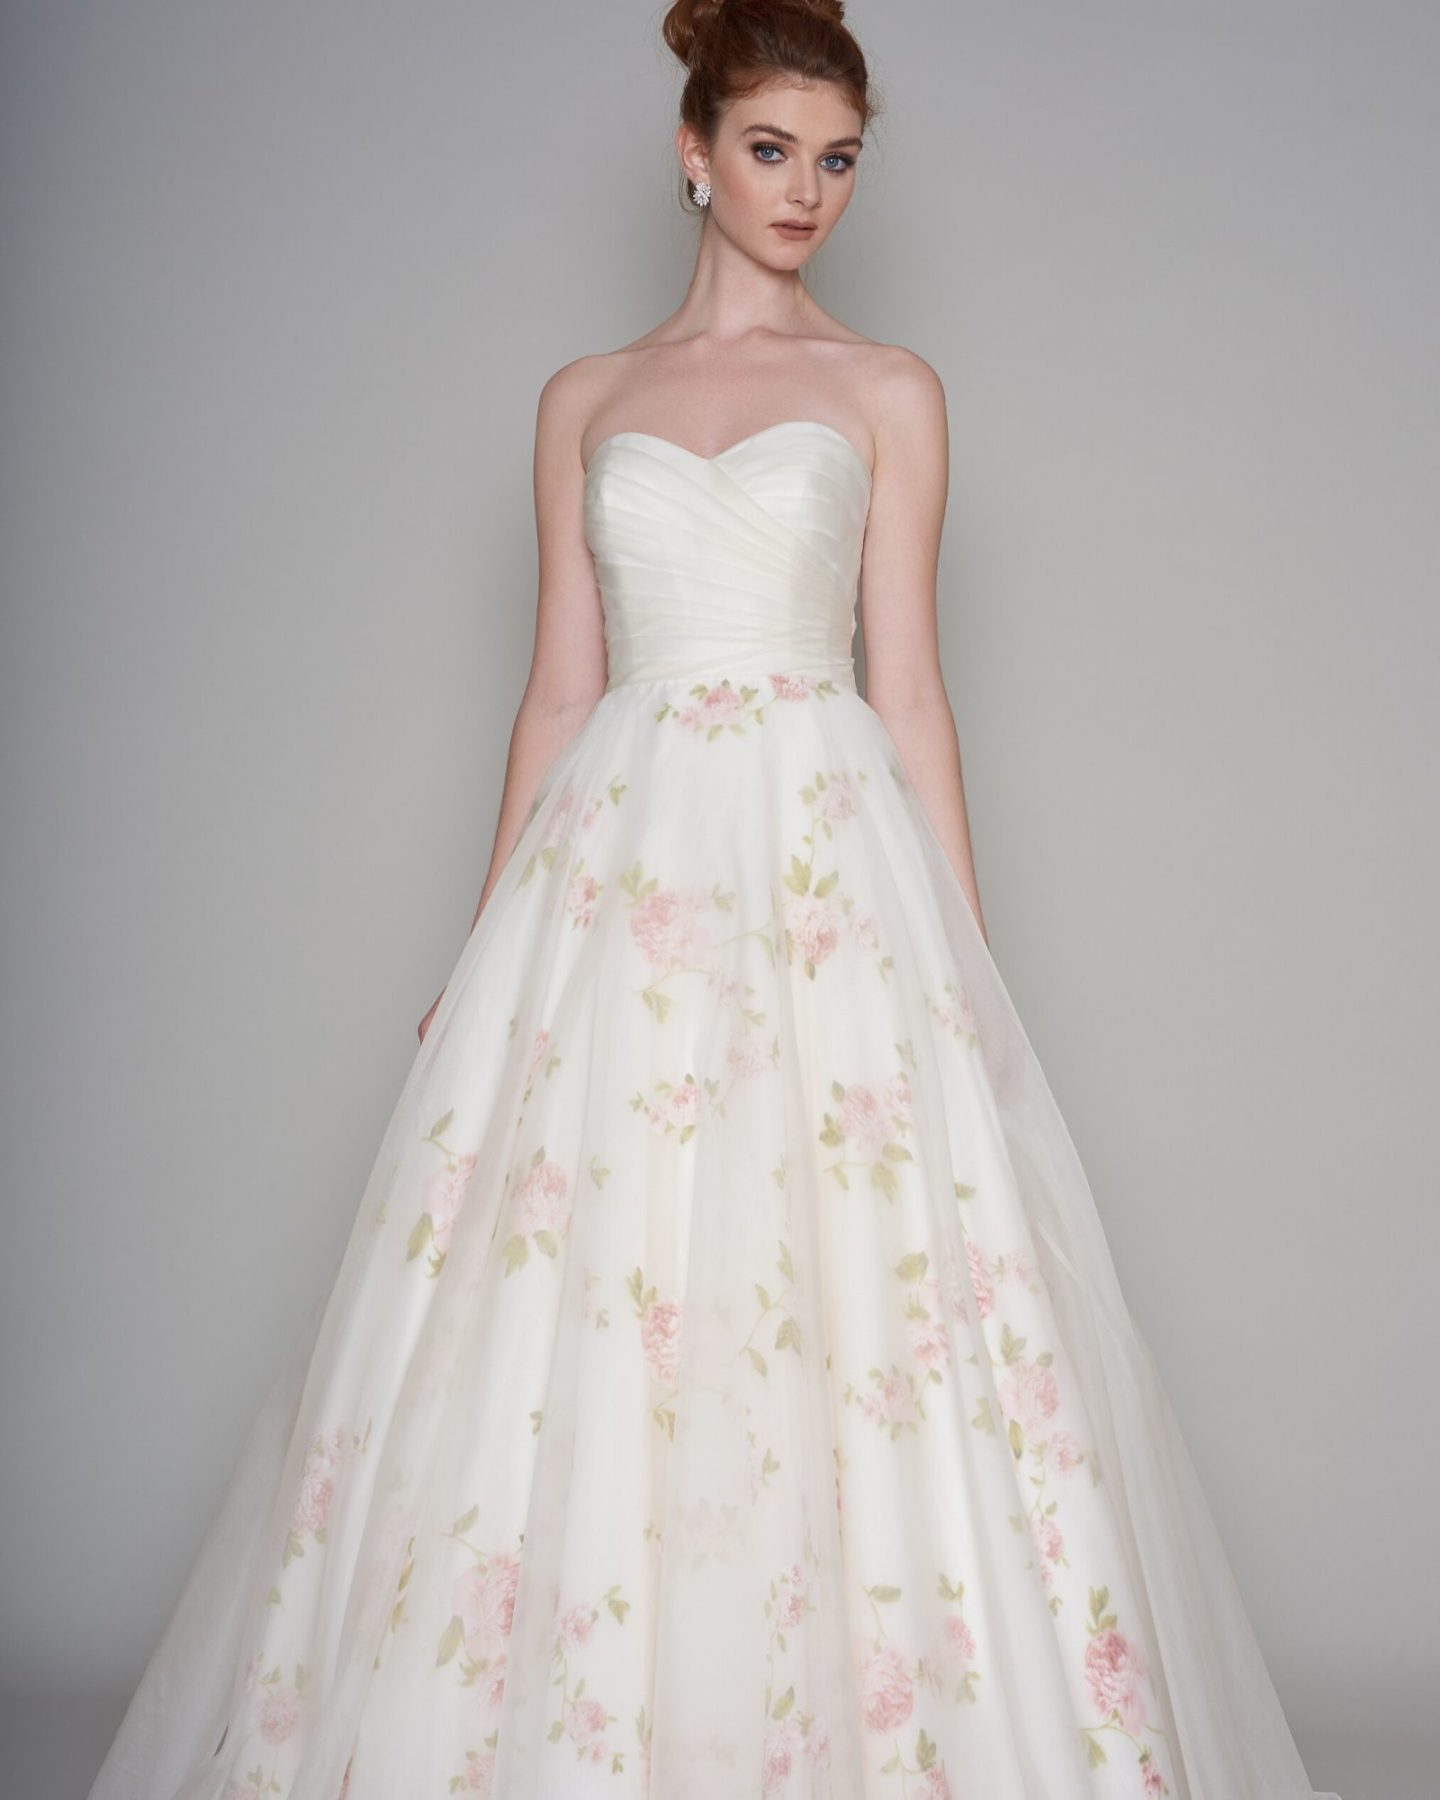 Rose print wedding dress Annie by Loulou Bridal